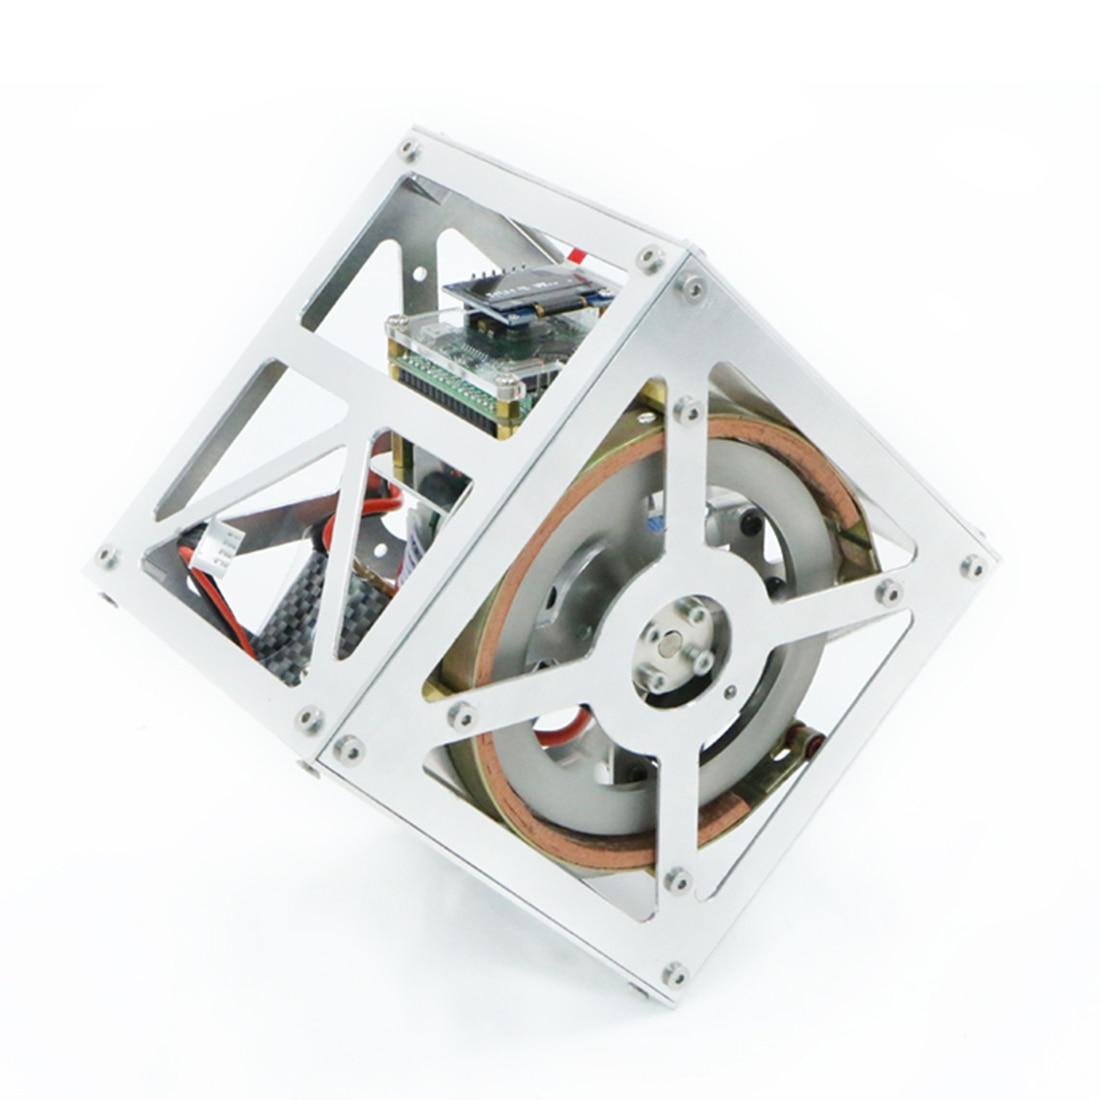 Reversible Single Point Balance Block Unilateral Self-Balancing Cubli Bblock Steam Toy